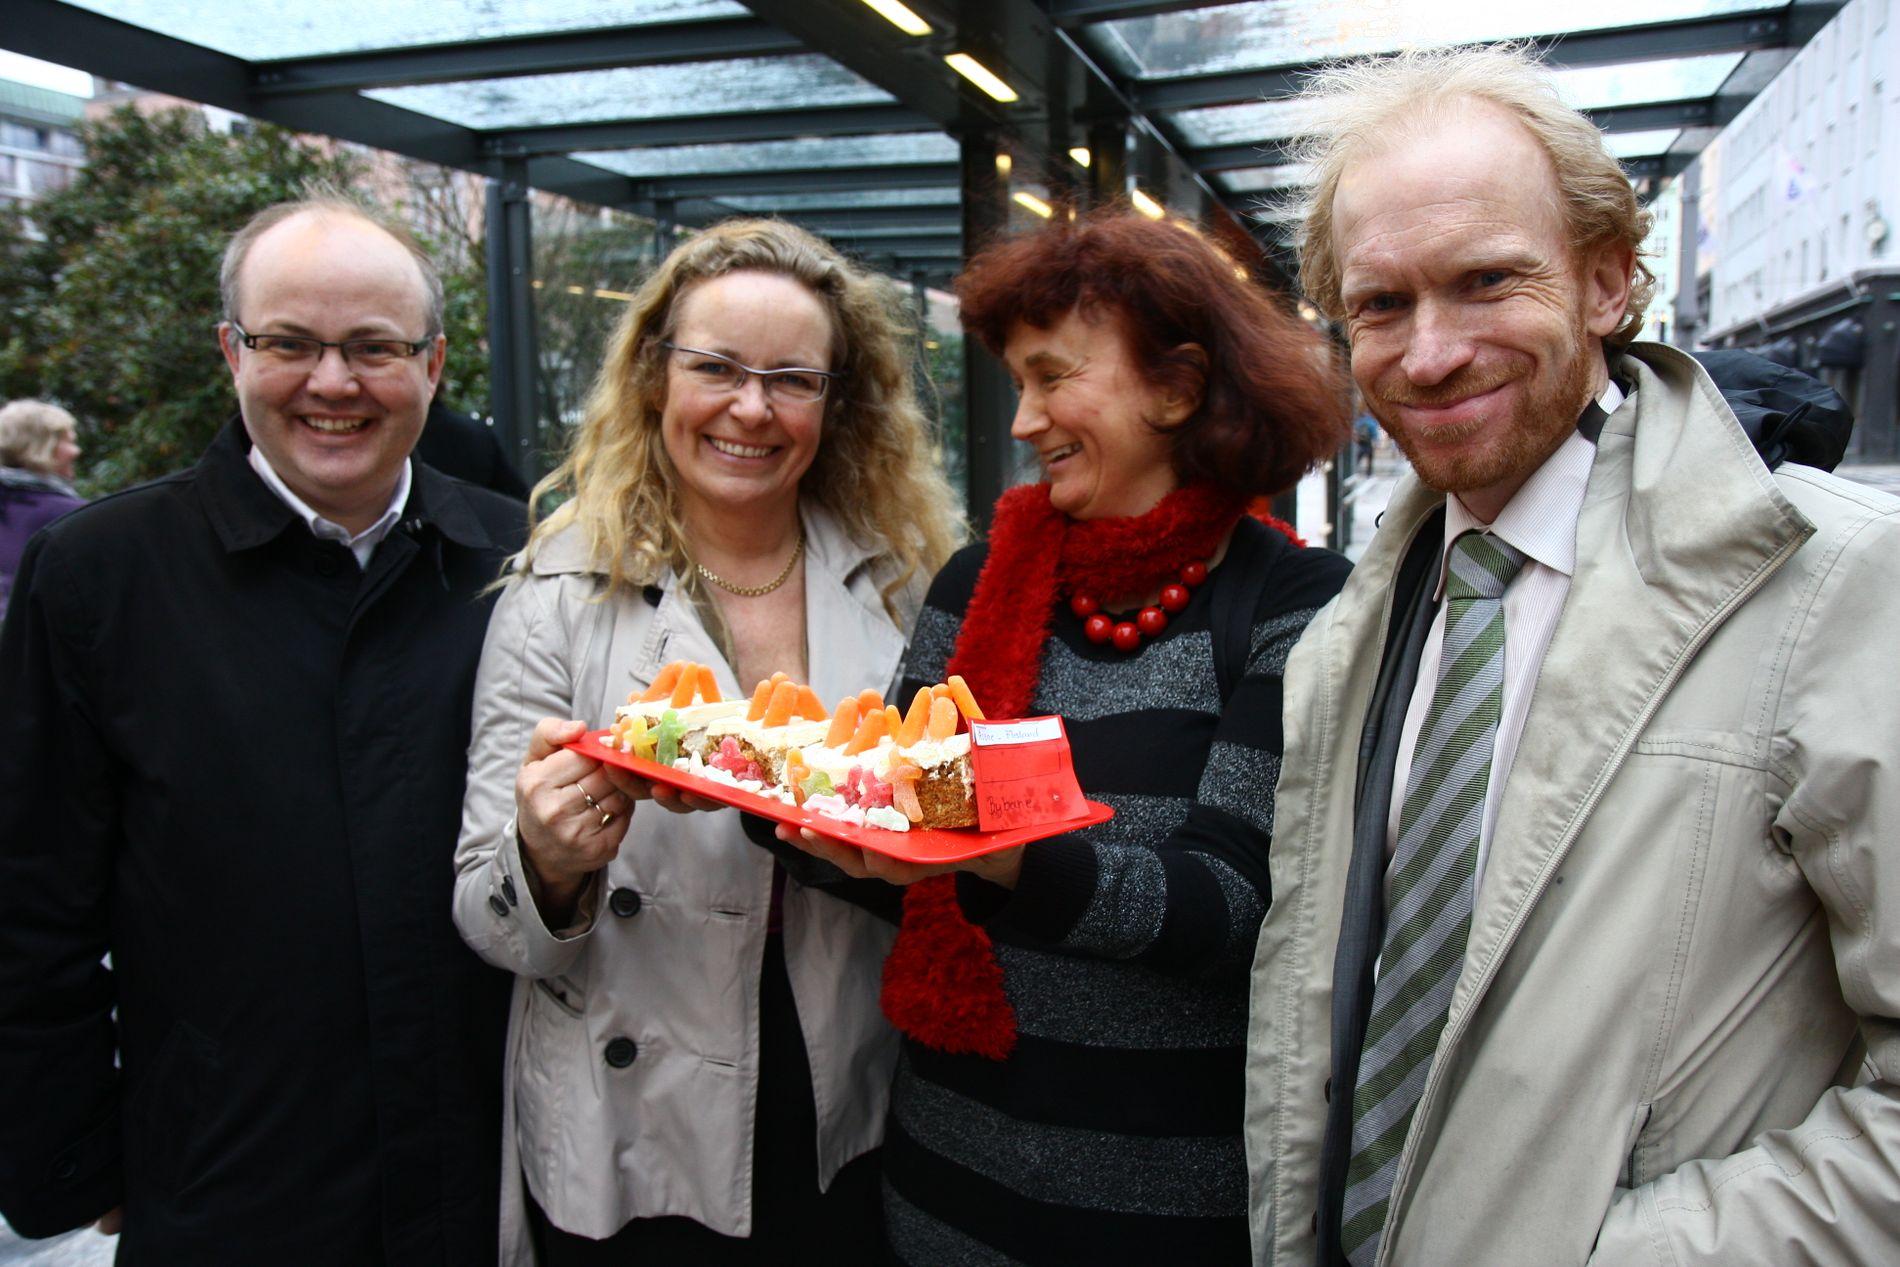 FEST: Ove Sverre Bjørdal (SP), Ruth Grung (AP), Oddny Miljeteig (SV) og Seinulf Tungesvik (SP) feirer vedtaket med bybanekake.FOTO: RUNE STØLÅS